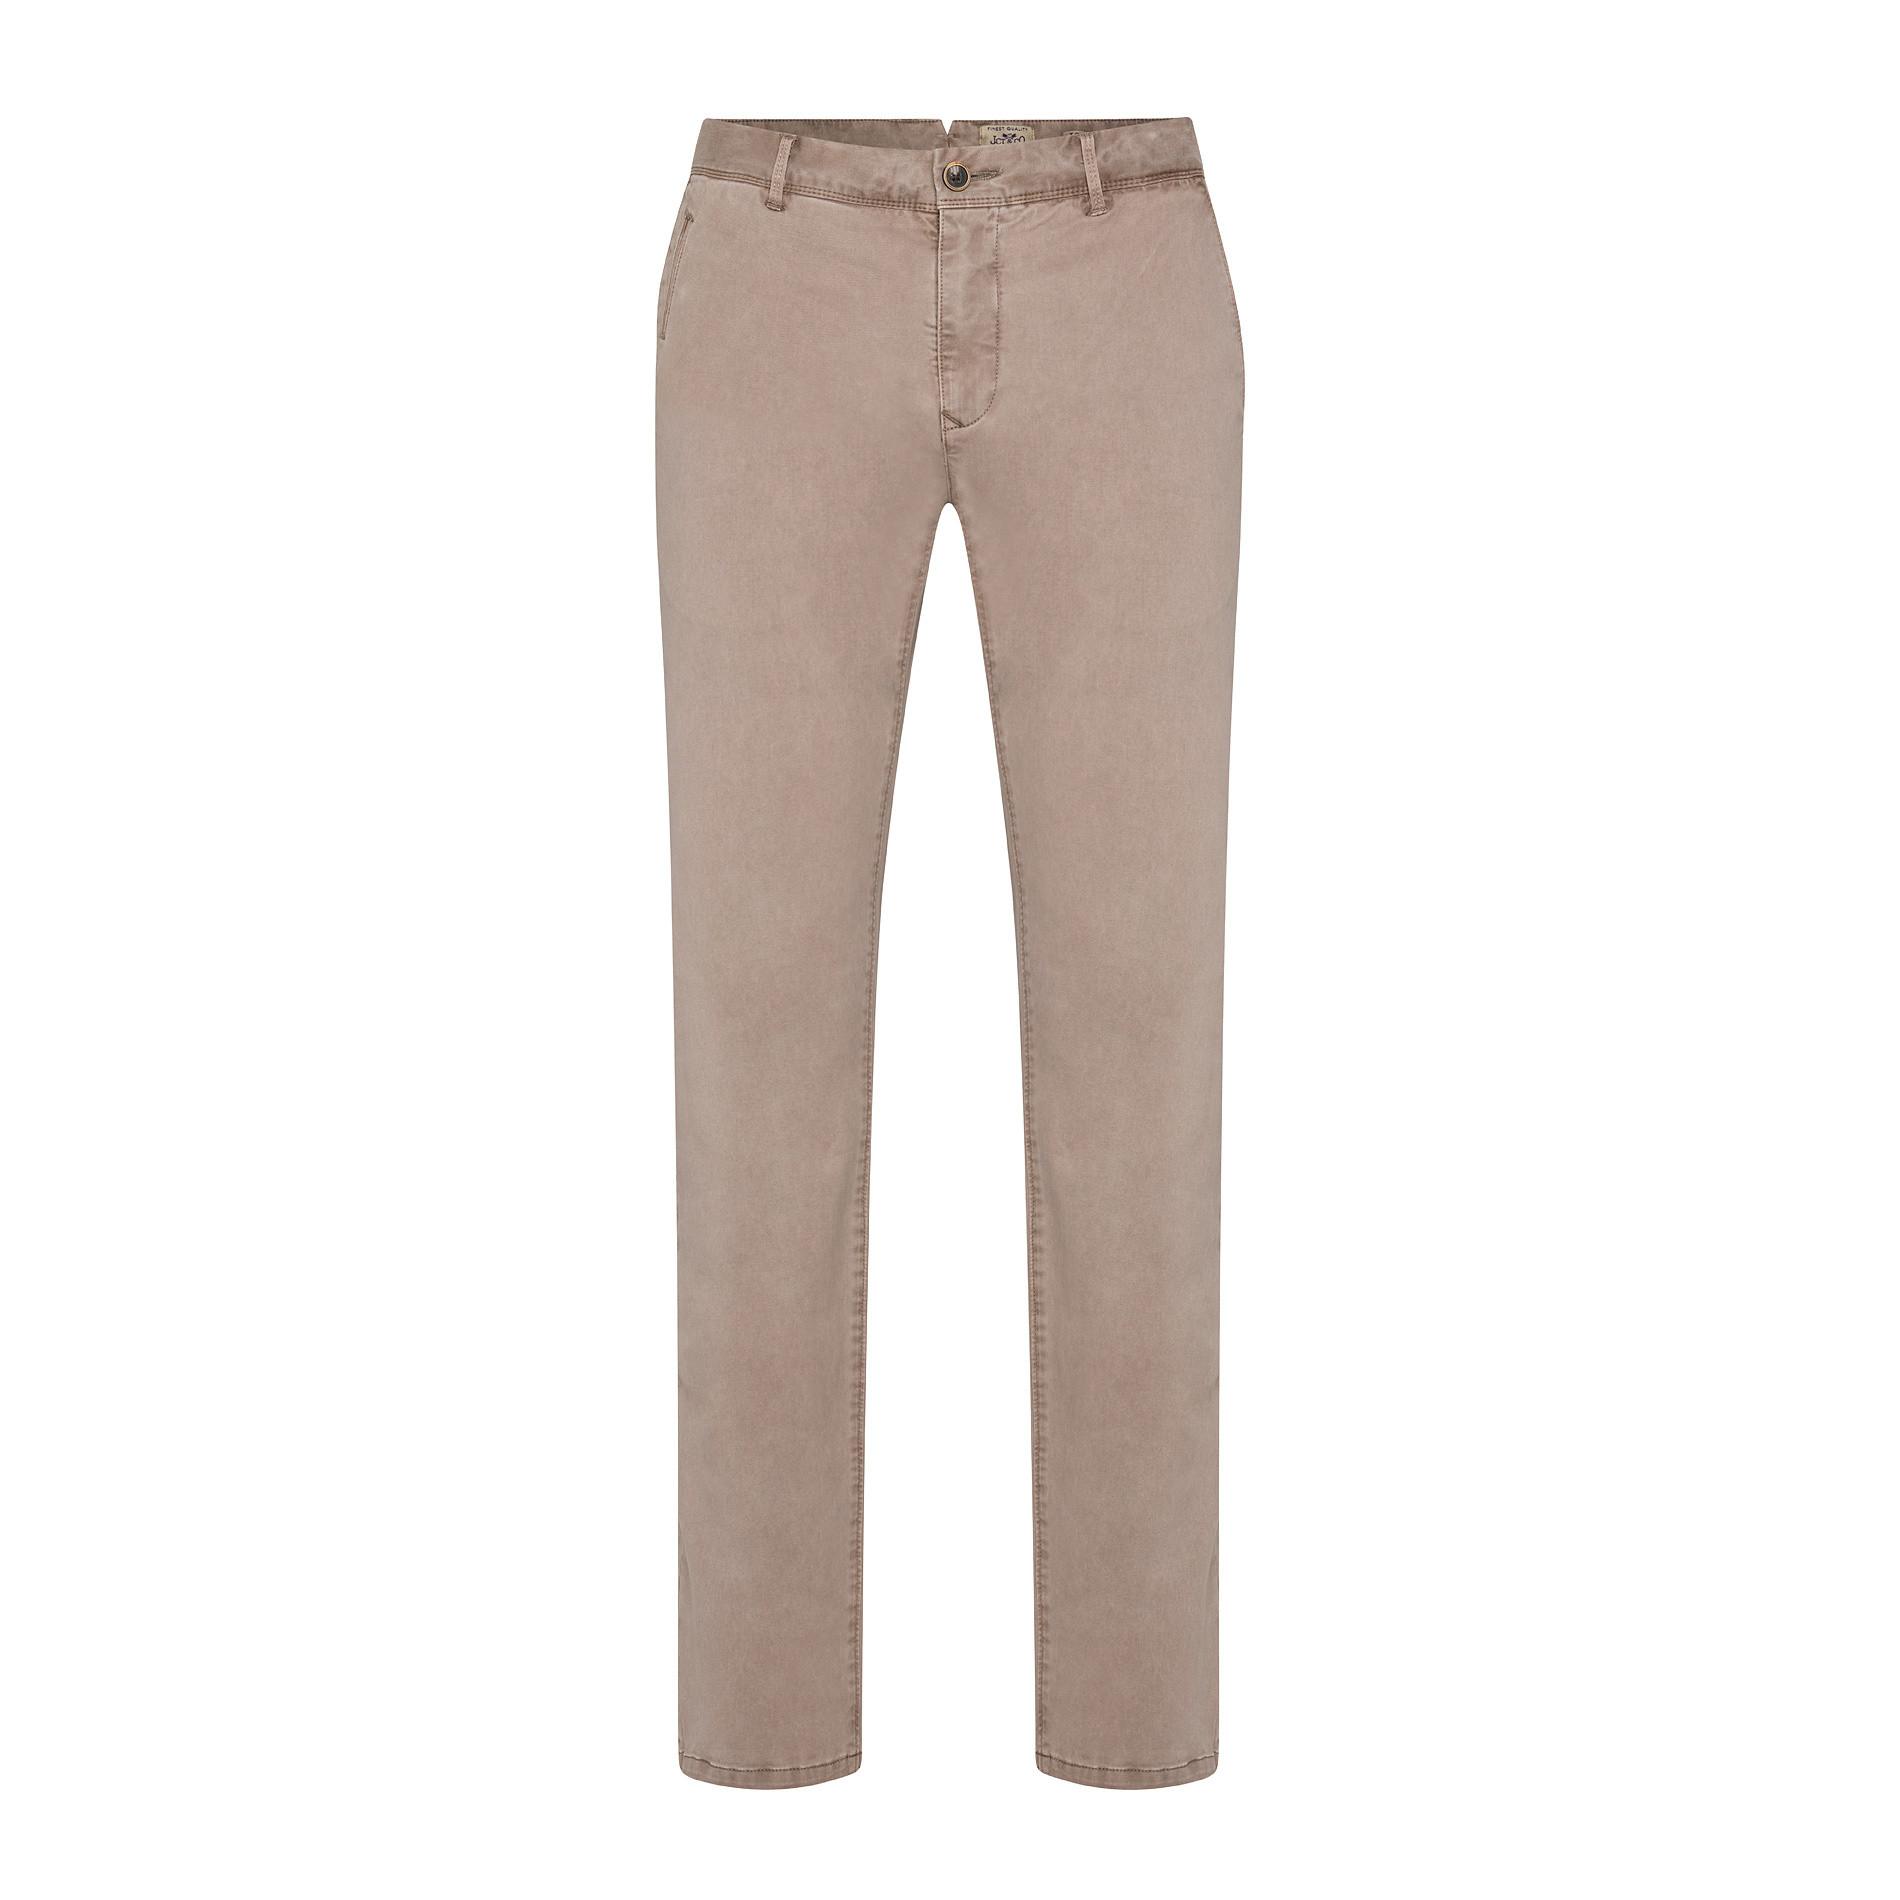 Pantaloni chino in tessuto stretch, Beige, large image number 0